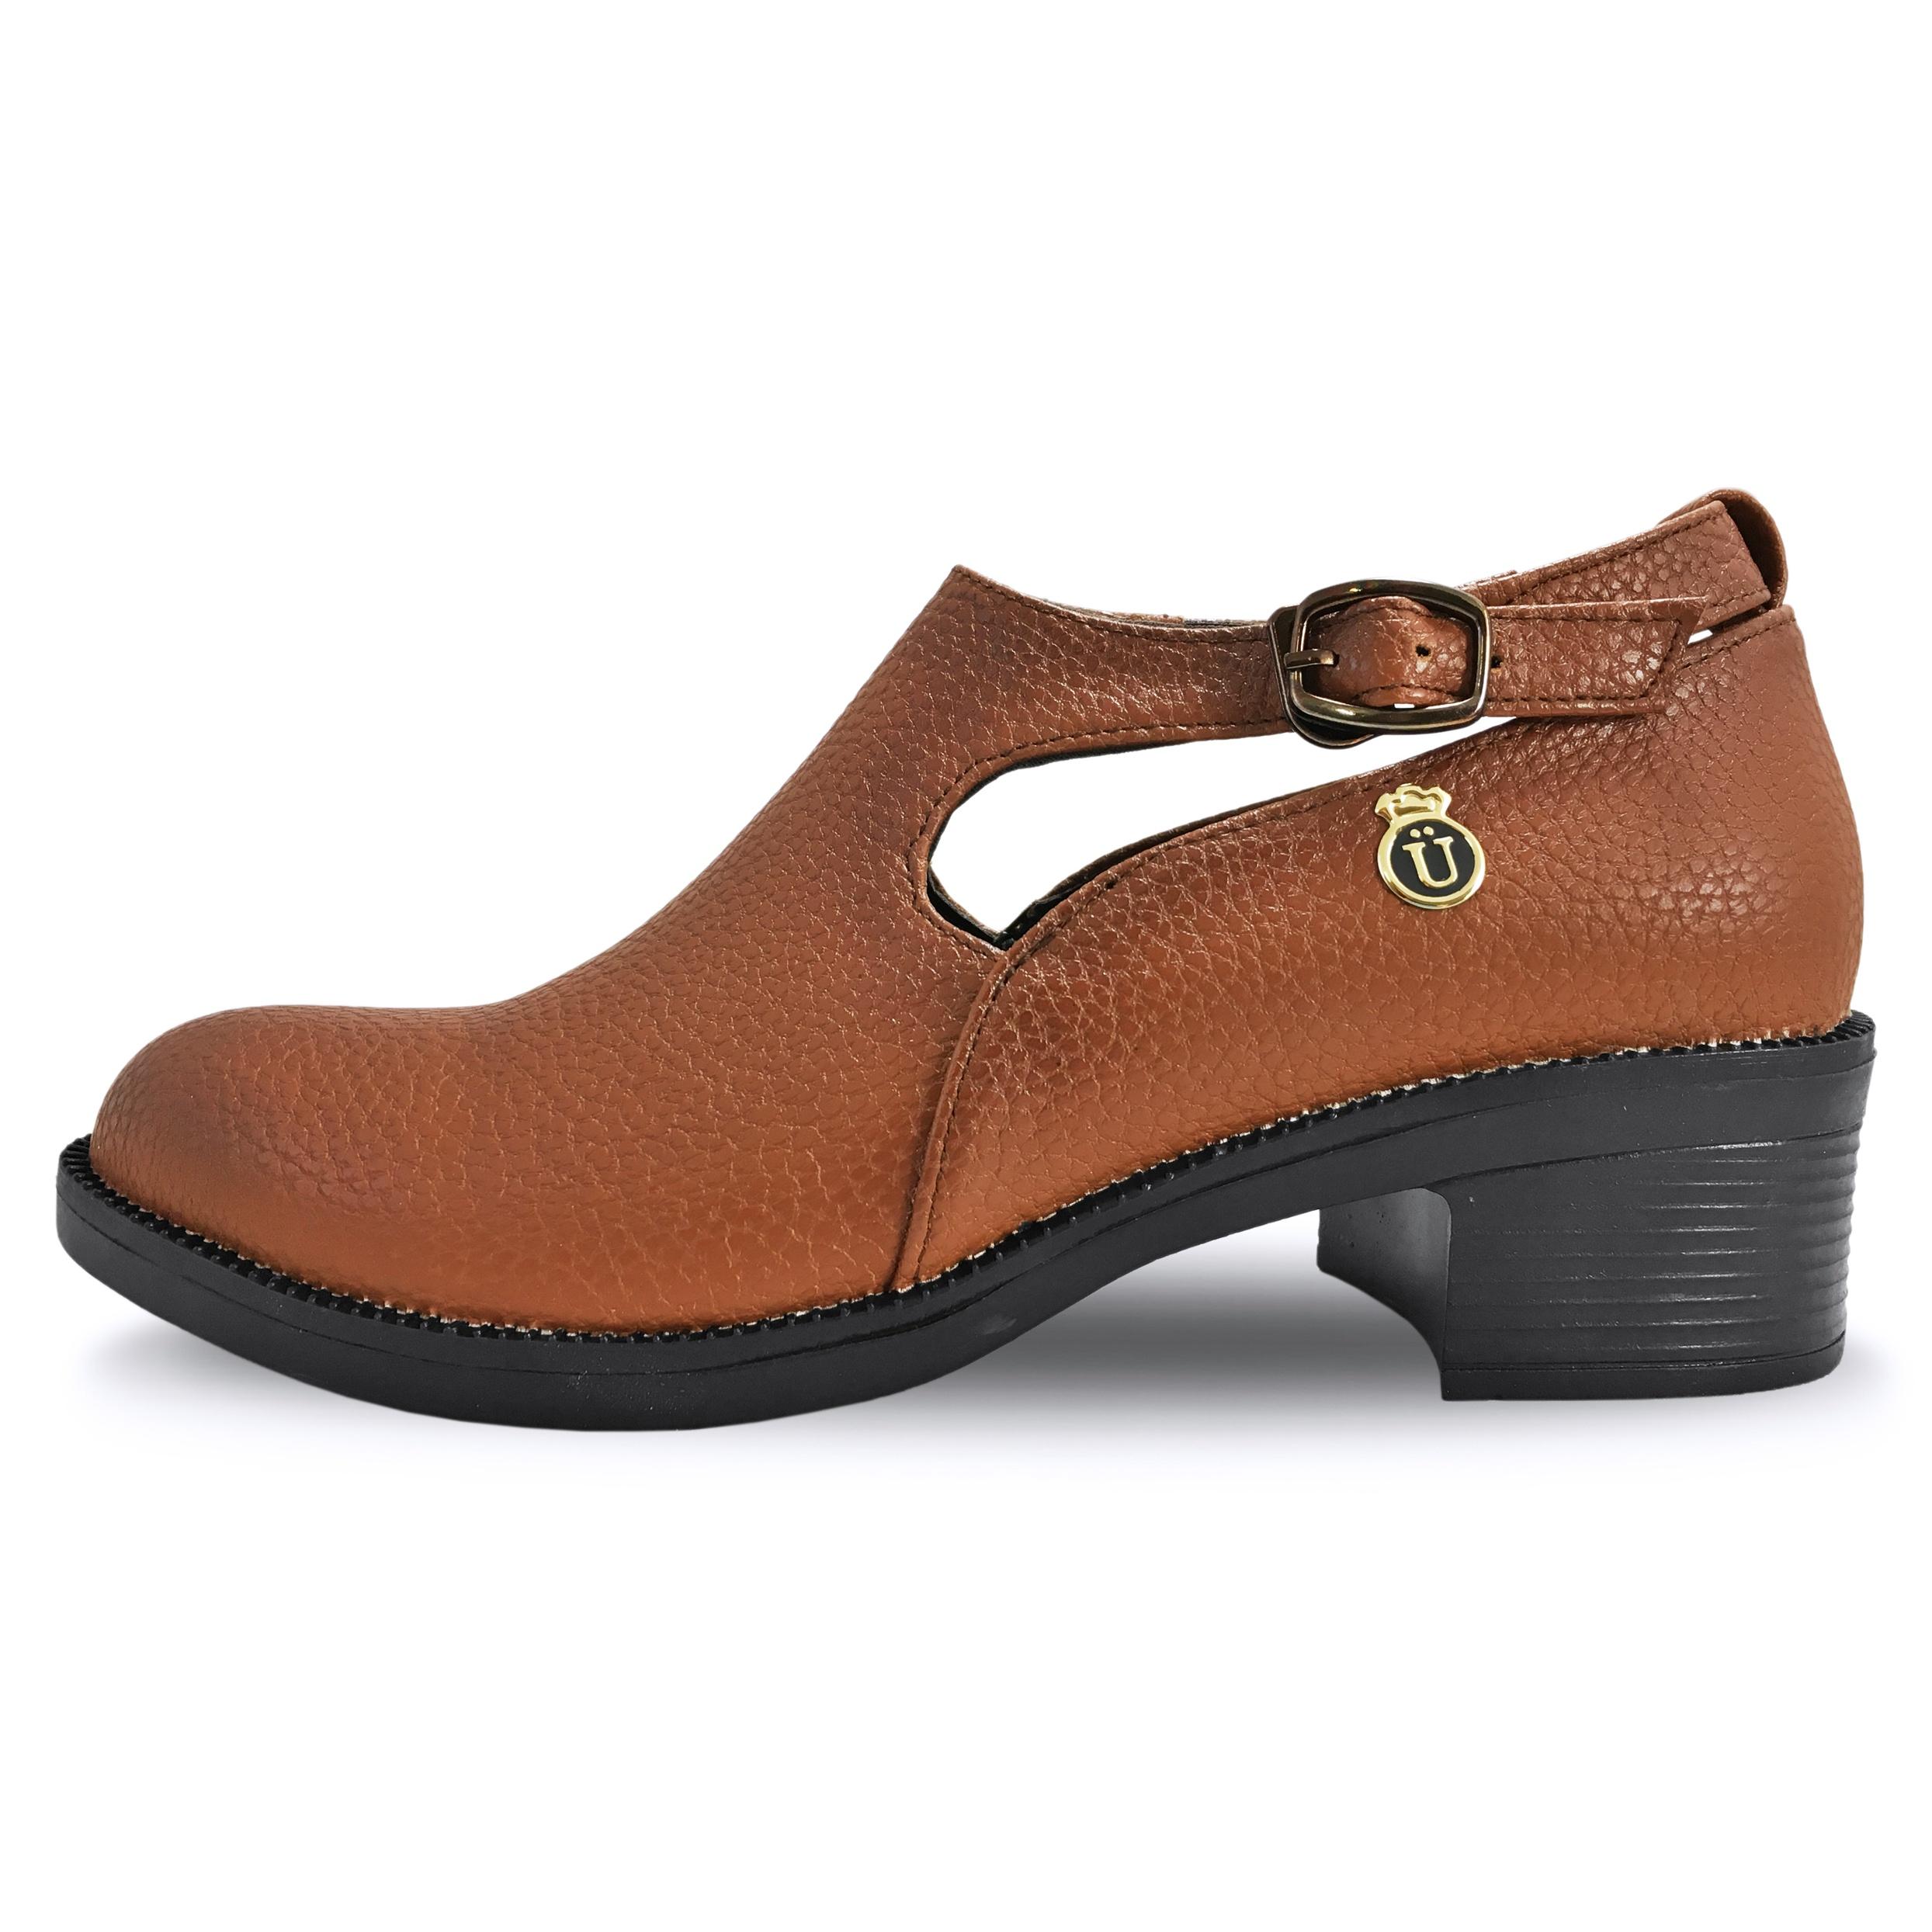 کفش زنانه مدل وفاق کد 3890